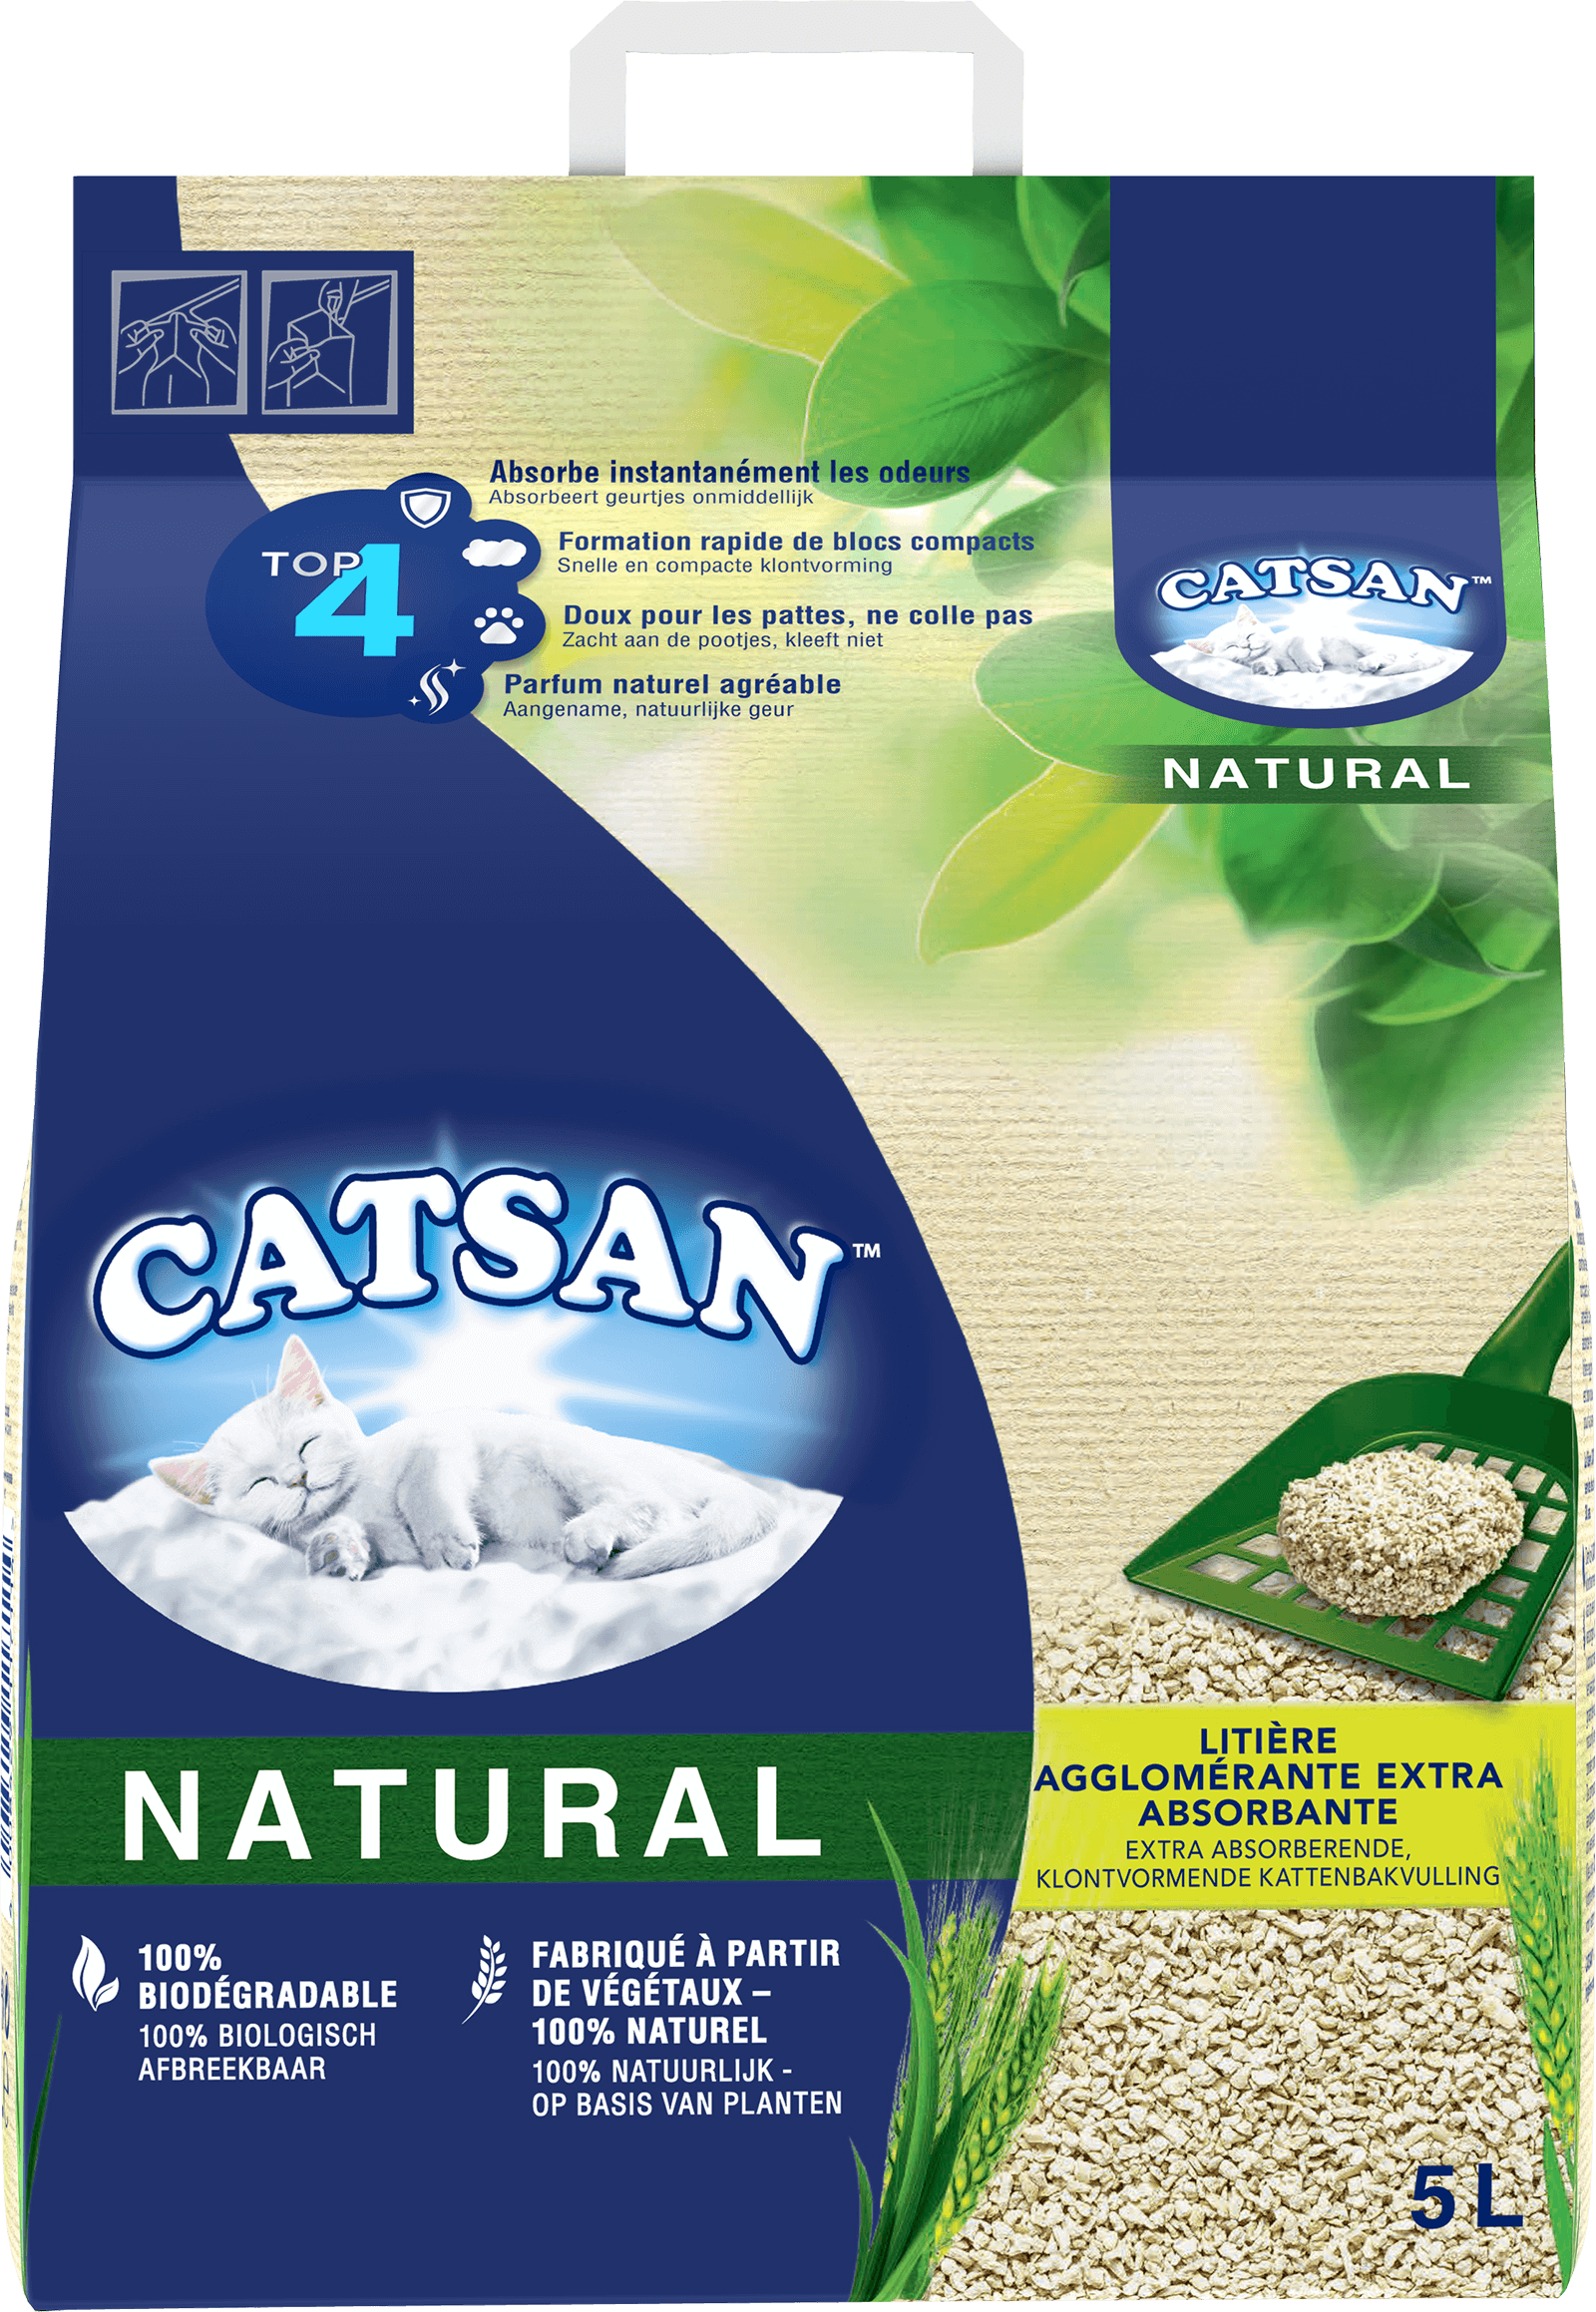 Litière CATSAN™ NATURAL AGGLOMÉRANTE